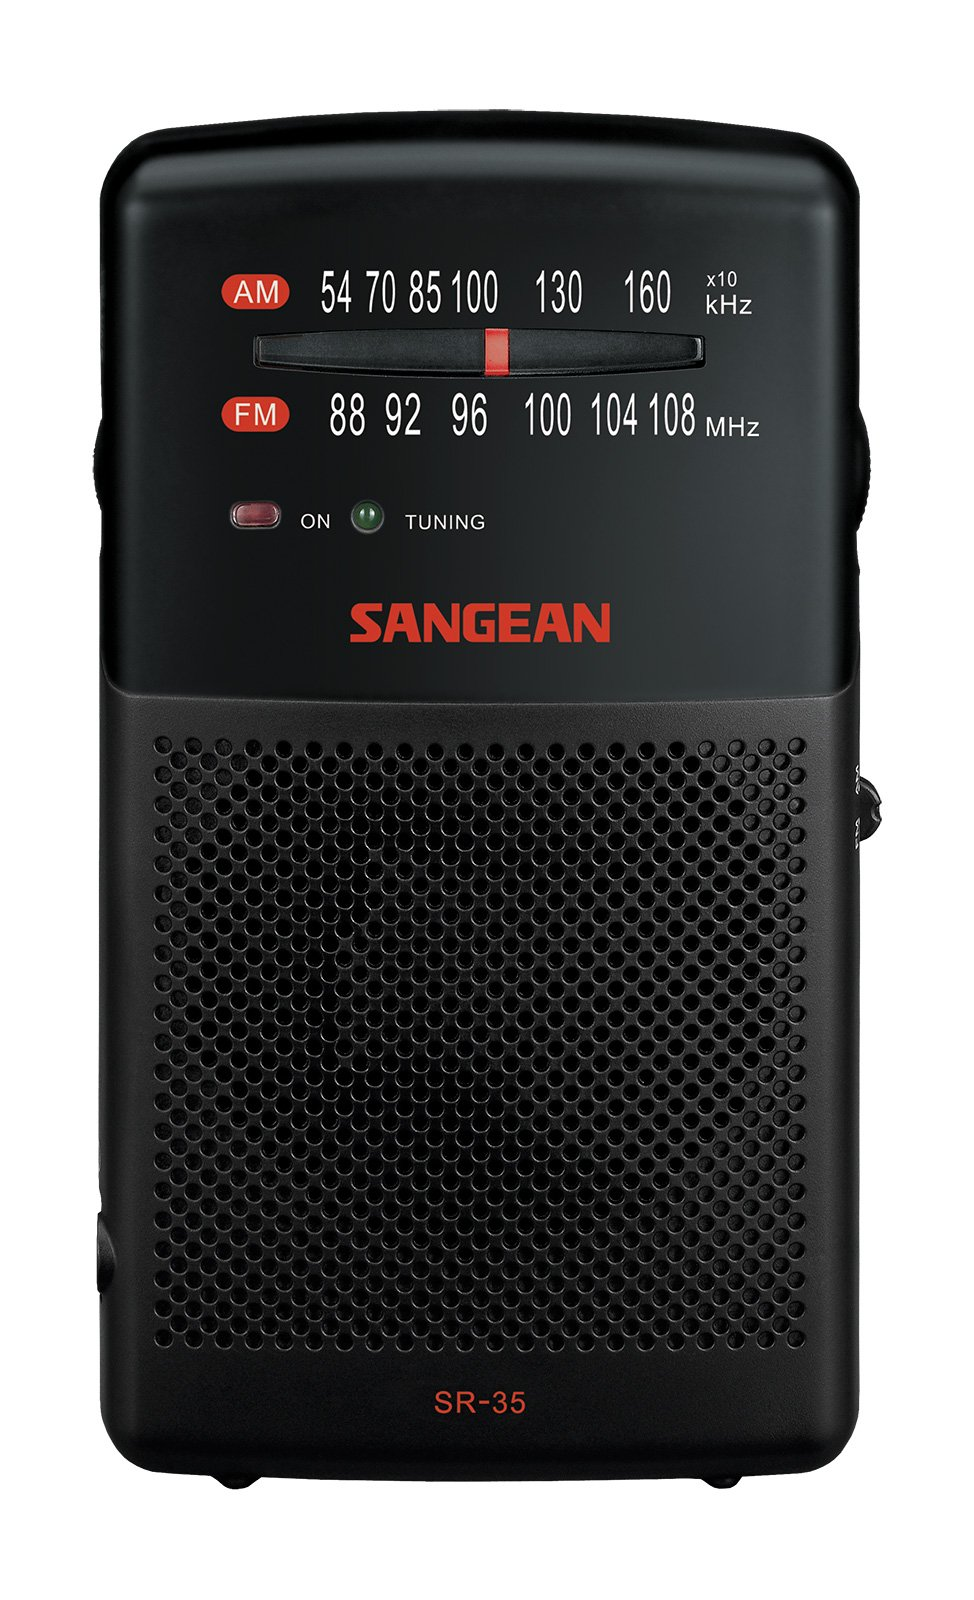 Sangean SR-35 AM/FM Pocket Analog Radio, Black